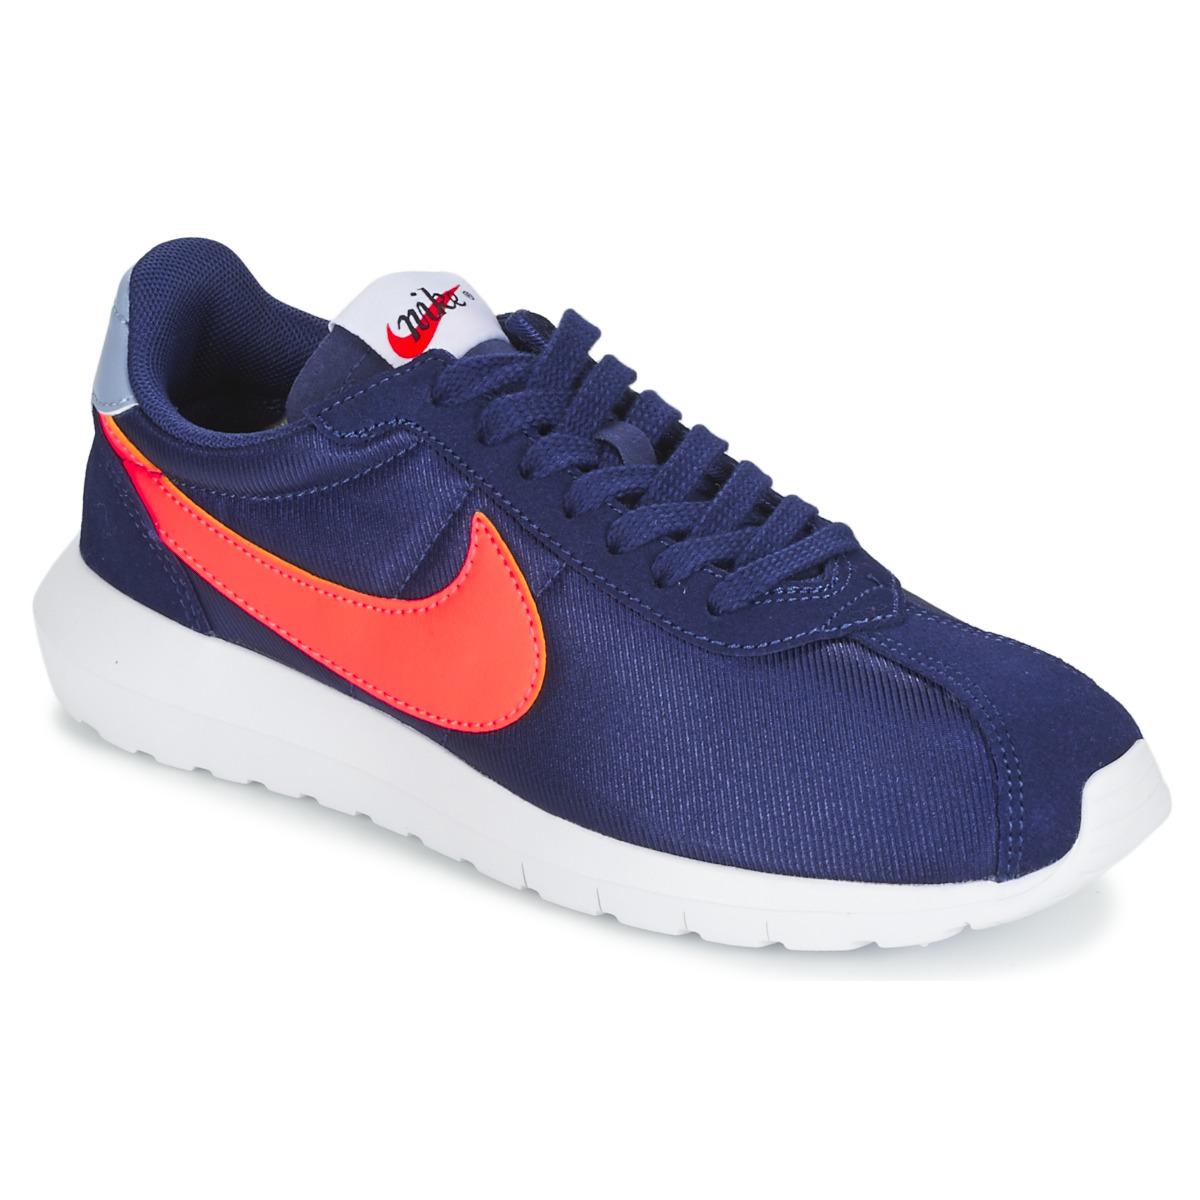 Nike ROSHE LD-1000 W Blau / Orange - Kostenloser Versand bei Spartoode ! - Schuhe Sneaker Low Damen 59,99 €